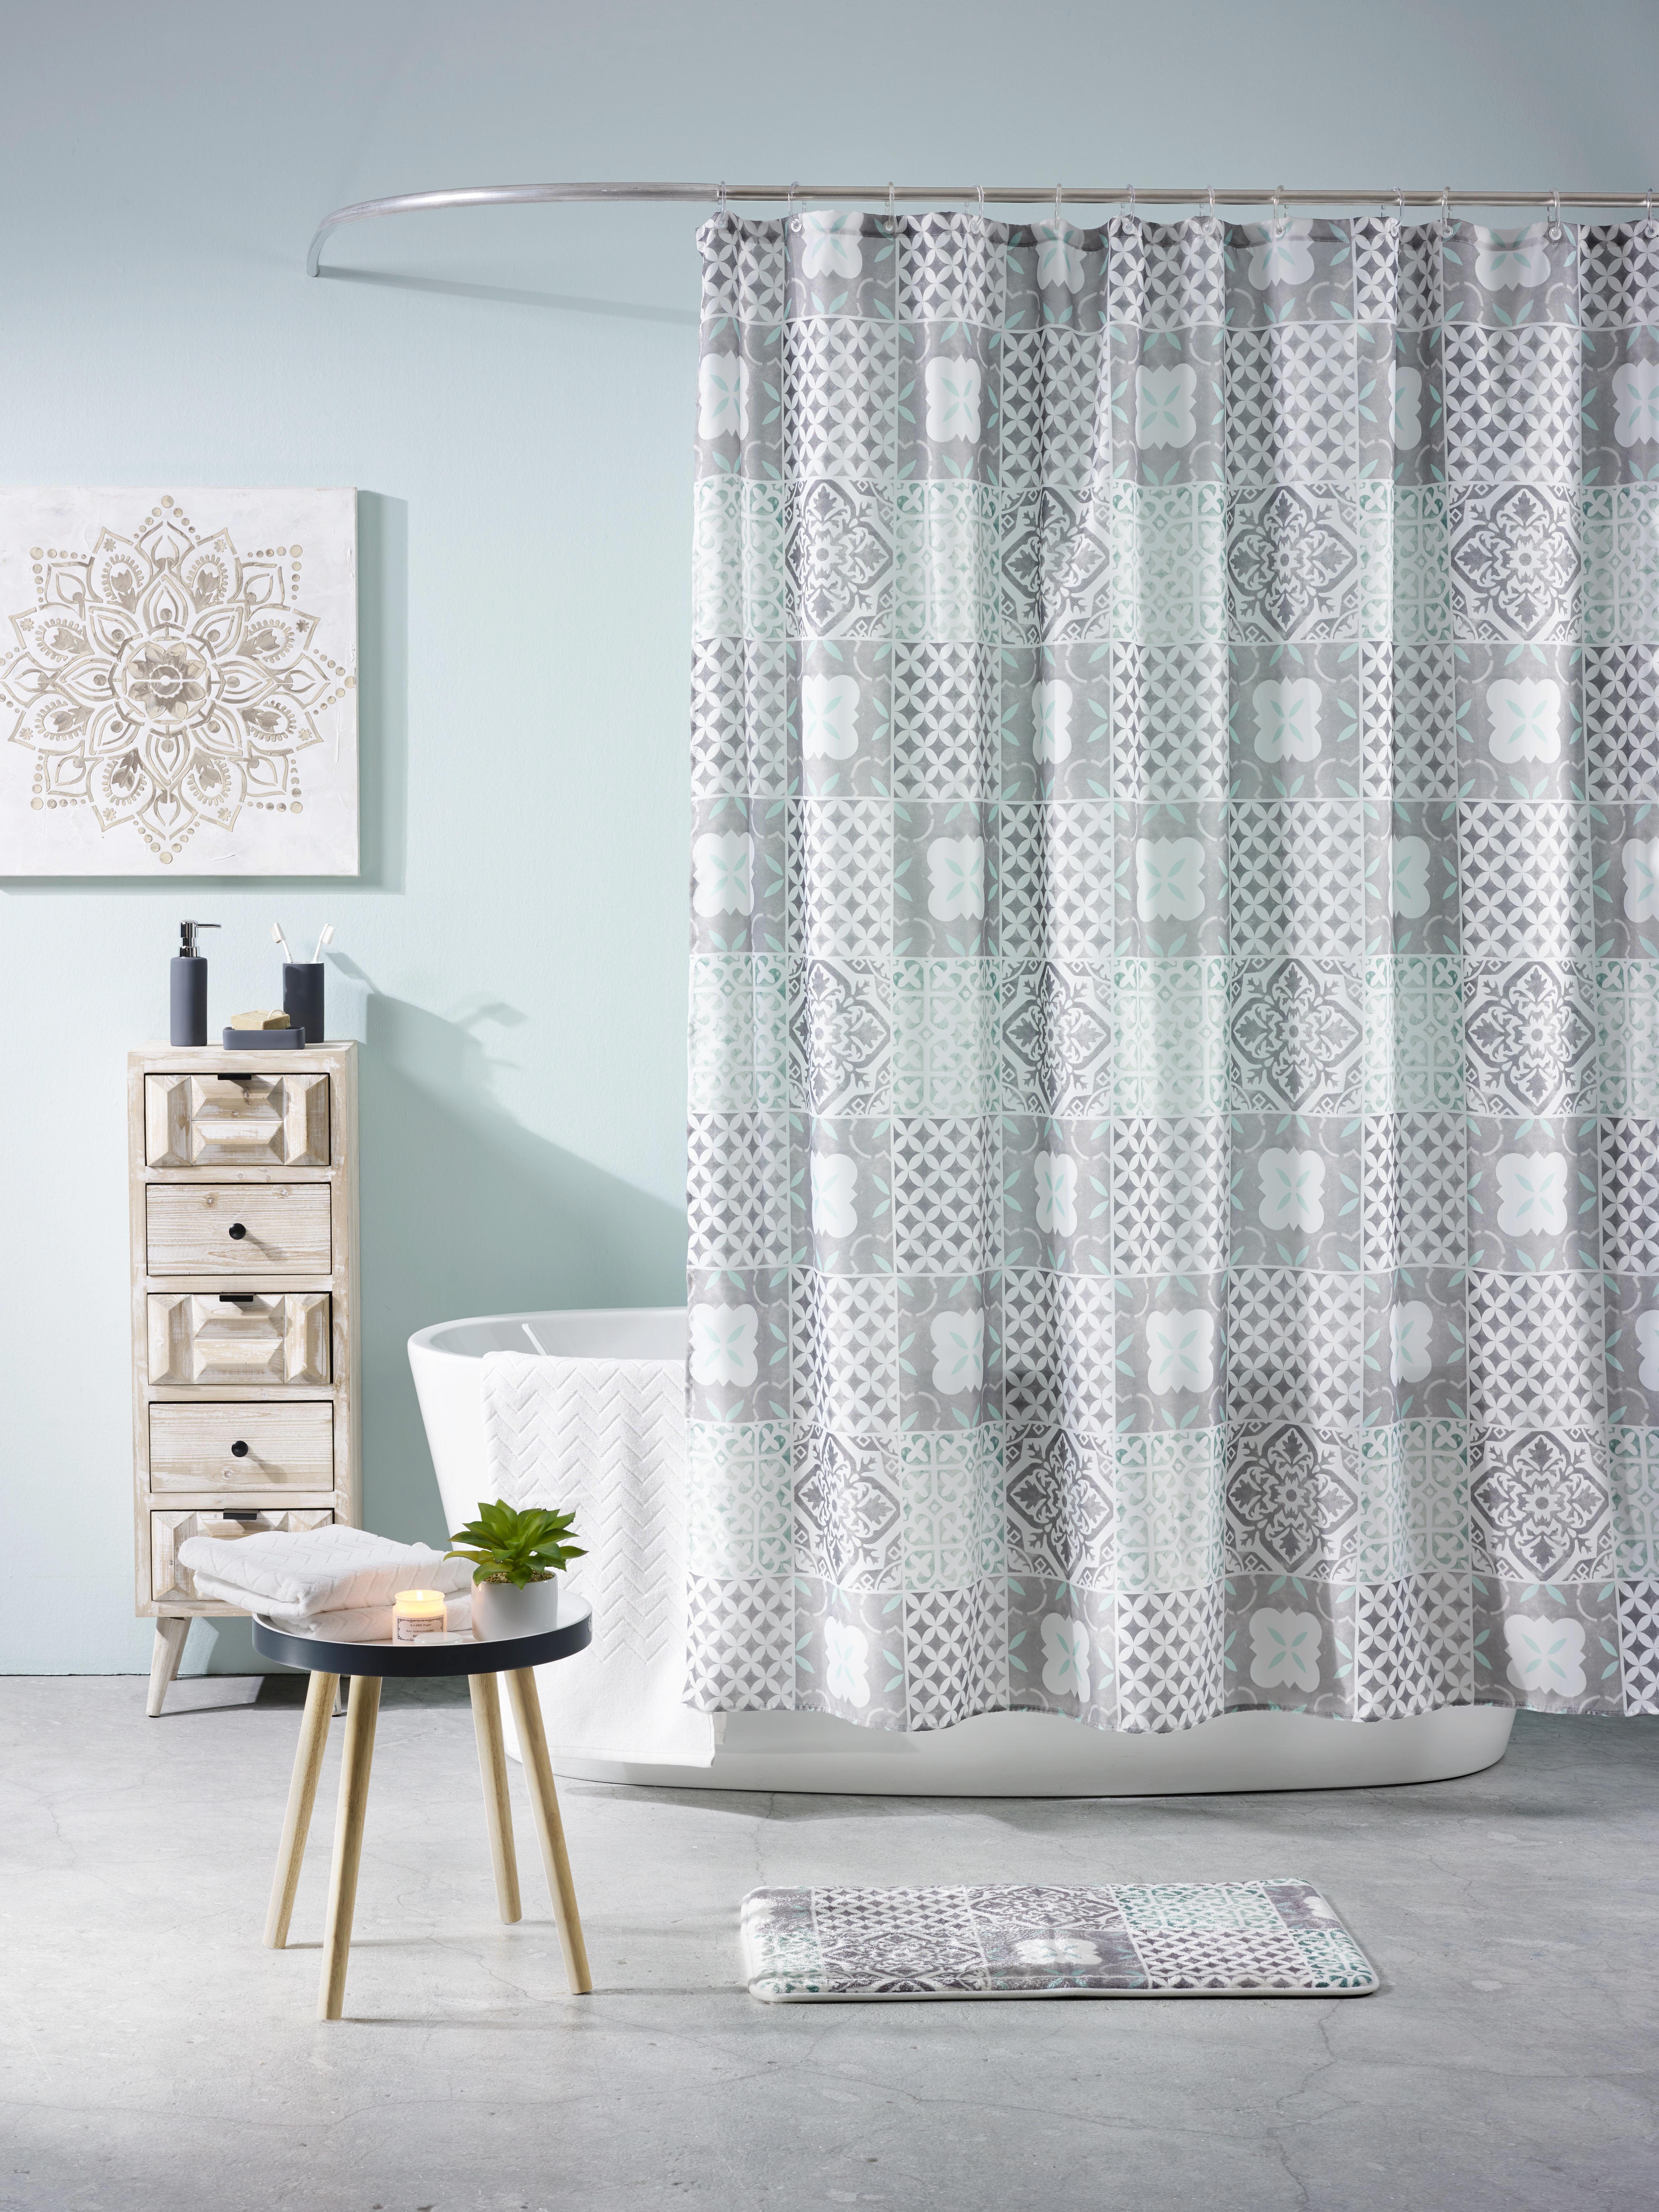 Předložka Koupelnová Marrakesh - bílá/šedá, Lifestyle, textil (45/75cm) - MÖMAX modern living